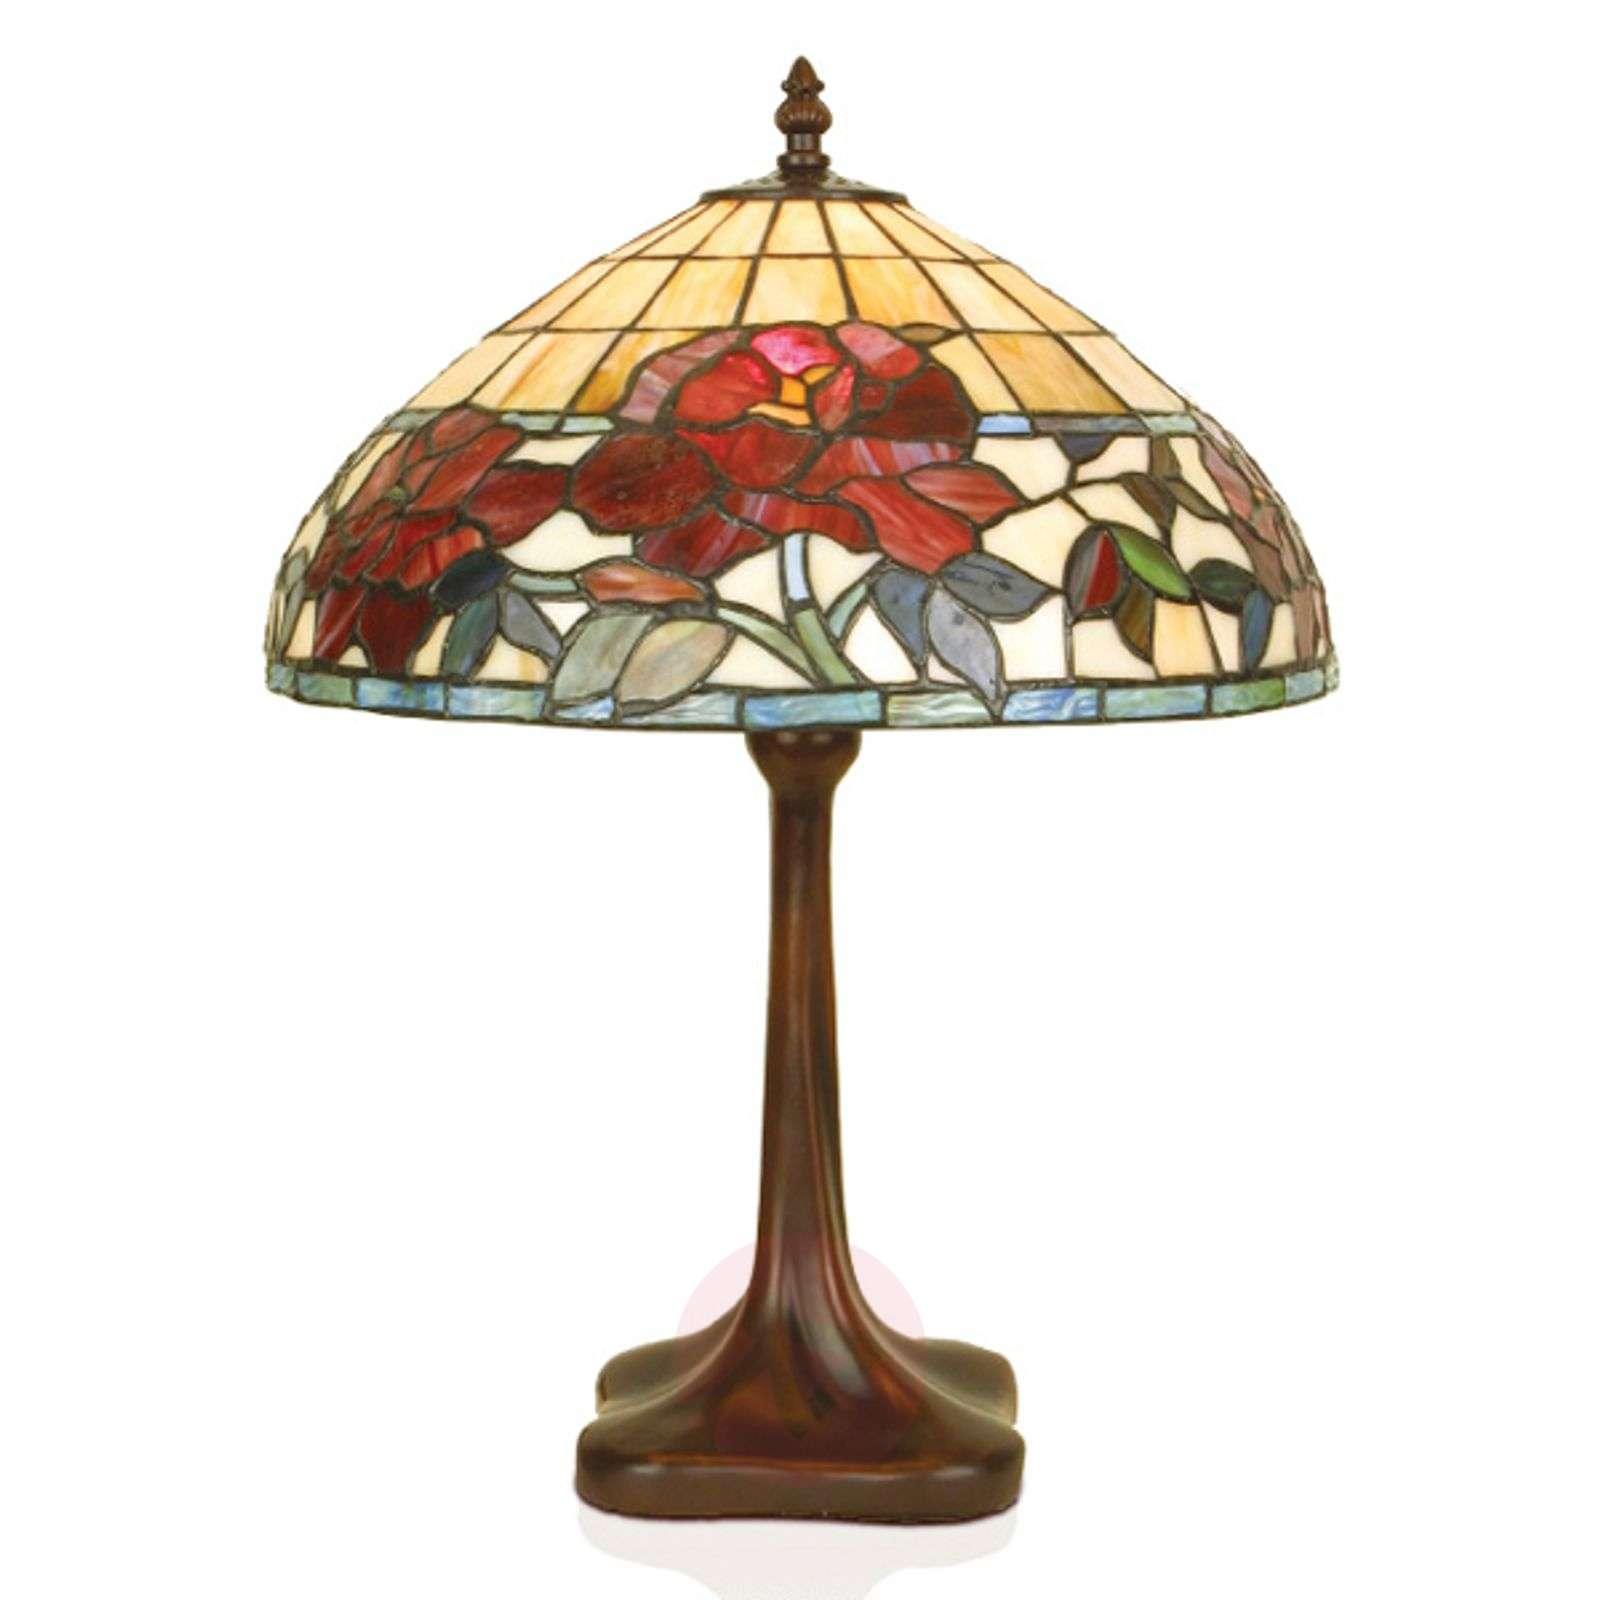 Handmade table lamp FINNA-1032178-01